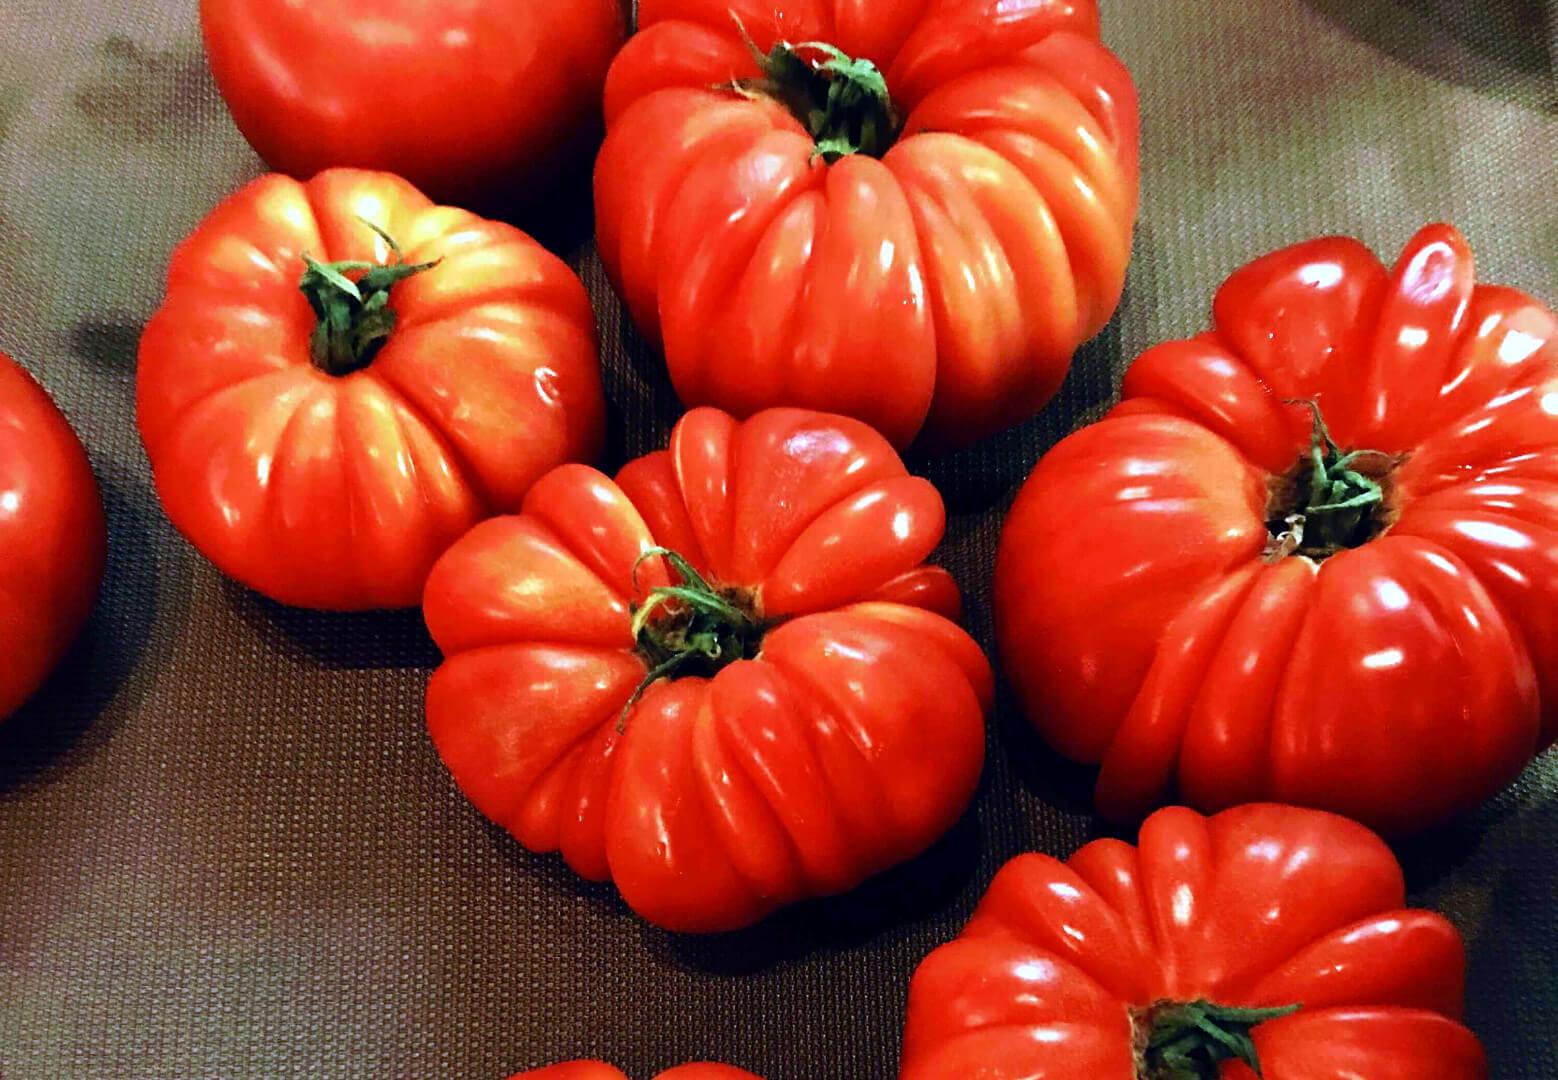 EVOO Masterclass Tomatoes